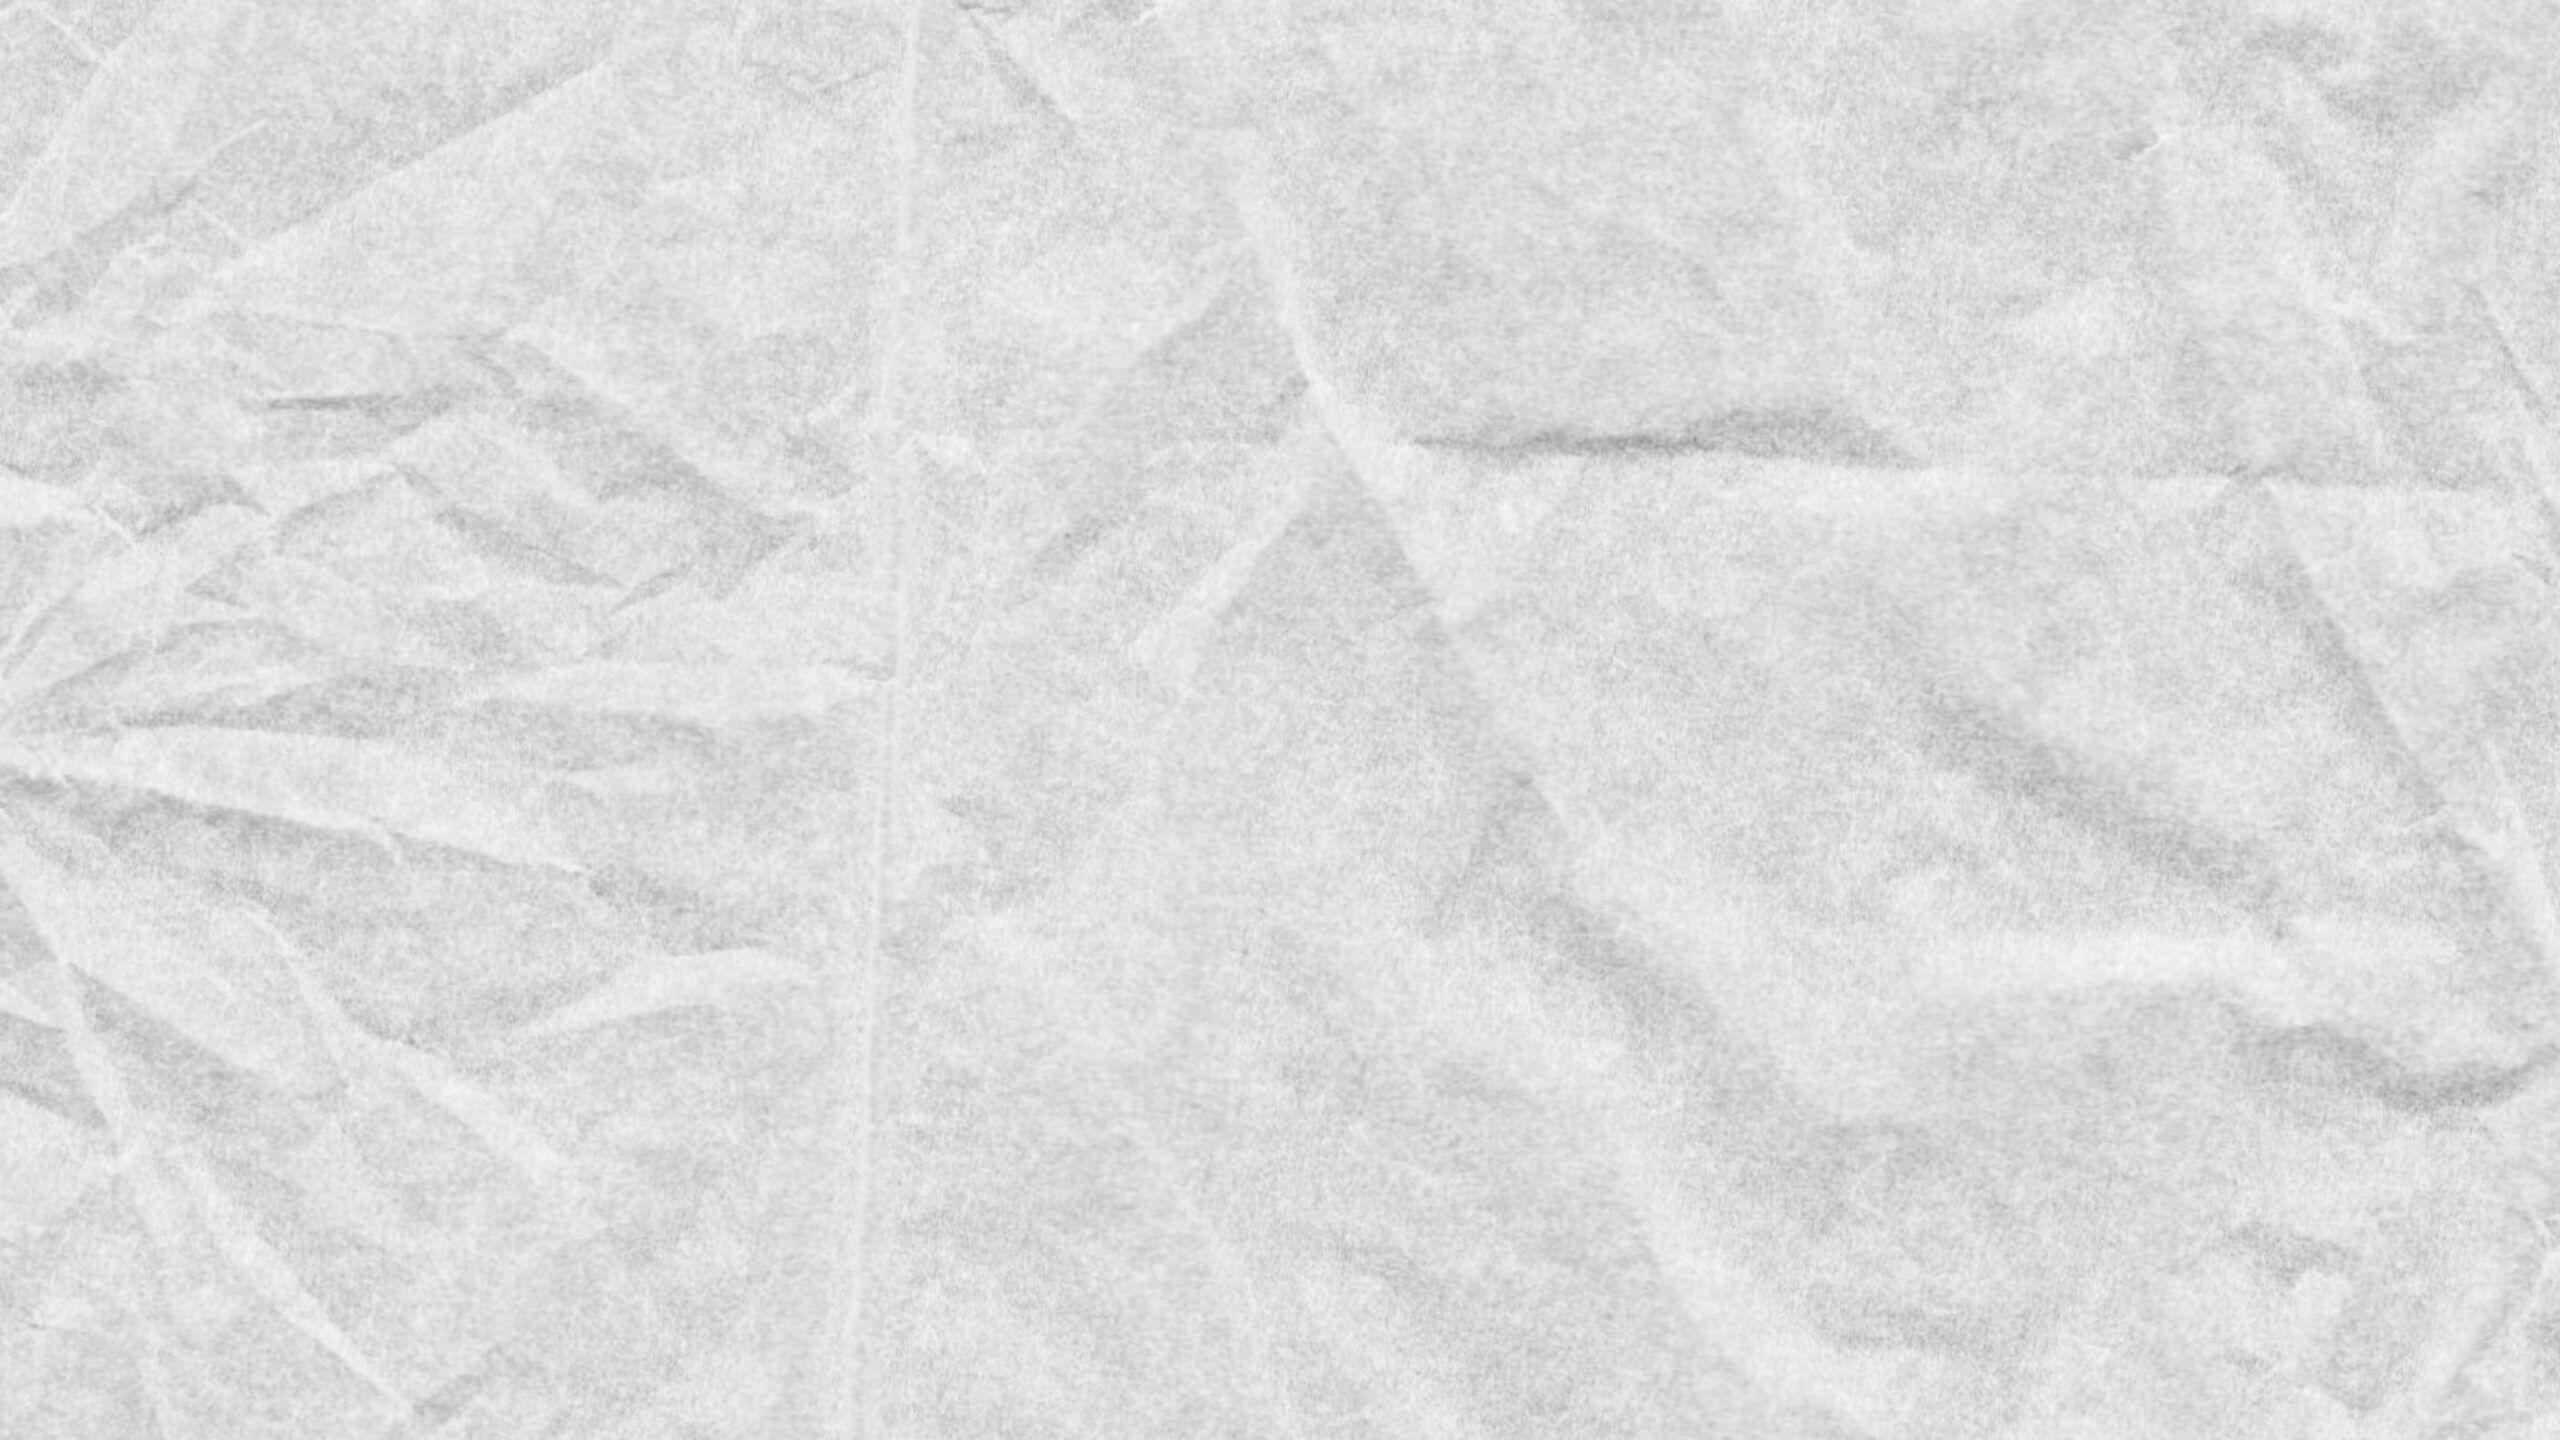 White Paper Texture Wallpaper Paper Texture Wallpaper Paper Texture White Textured Wallpaper